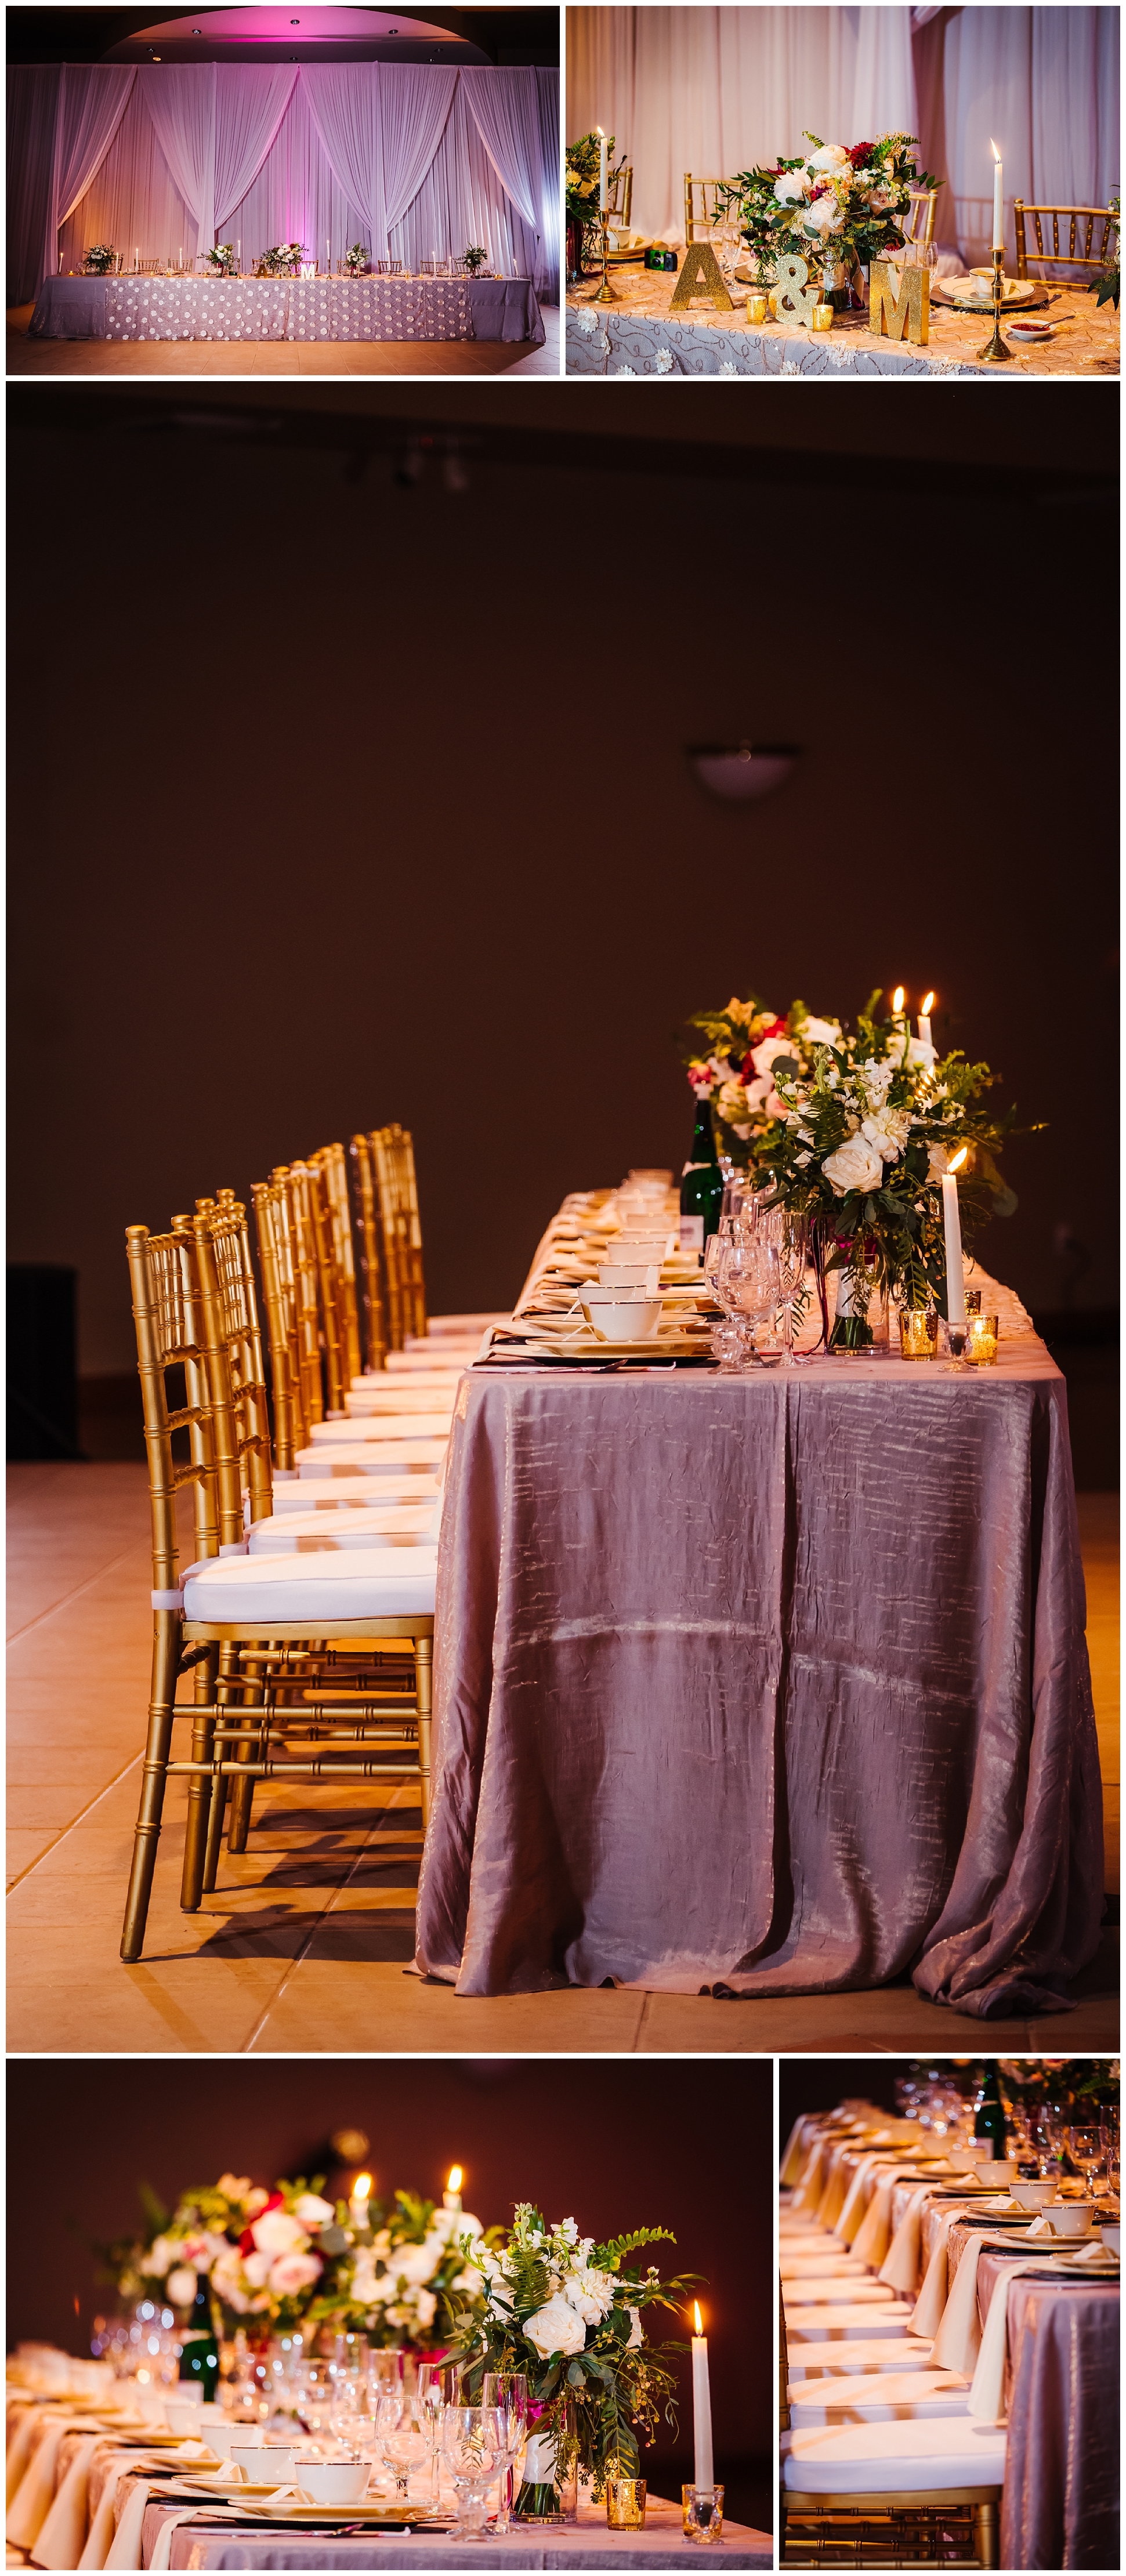 tampa-wedding-photographer-philipino-colorful-woods-ballroom-church-mass-confetti-fuscia_0064.jpg